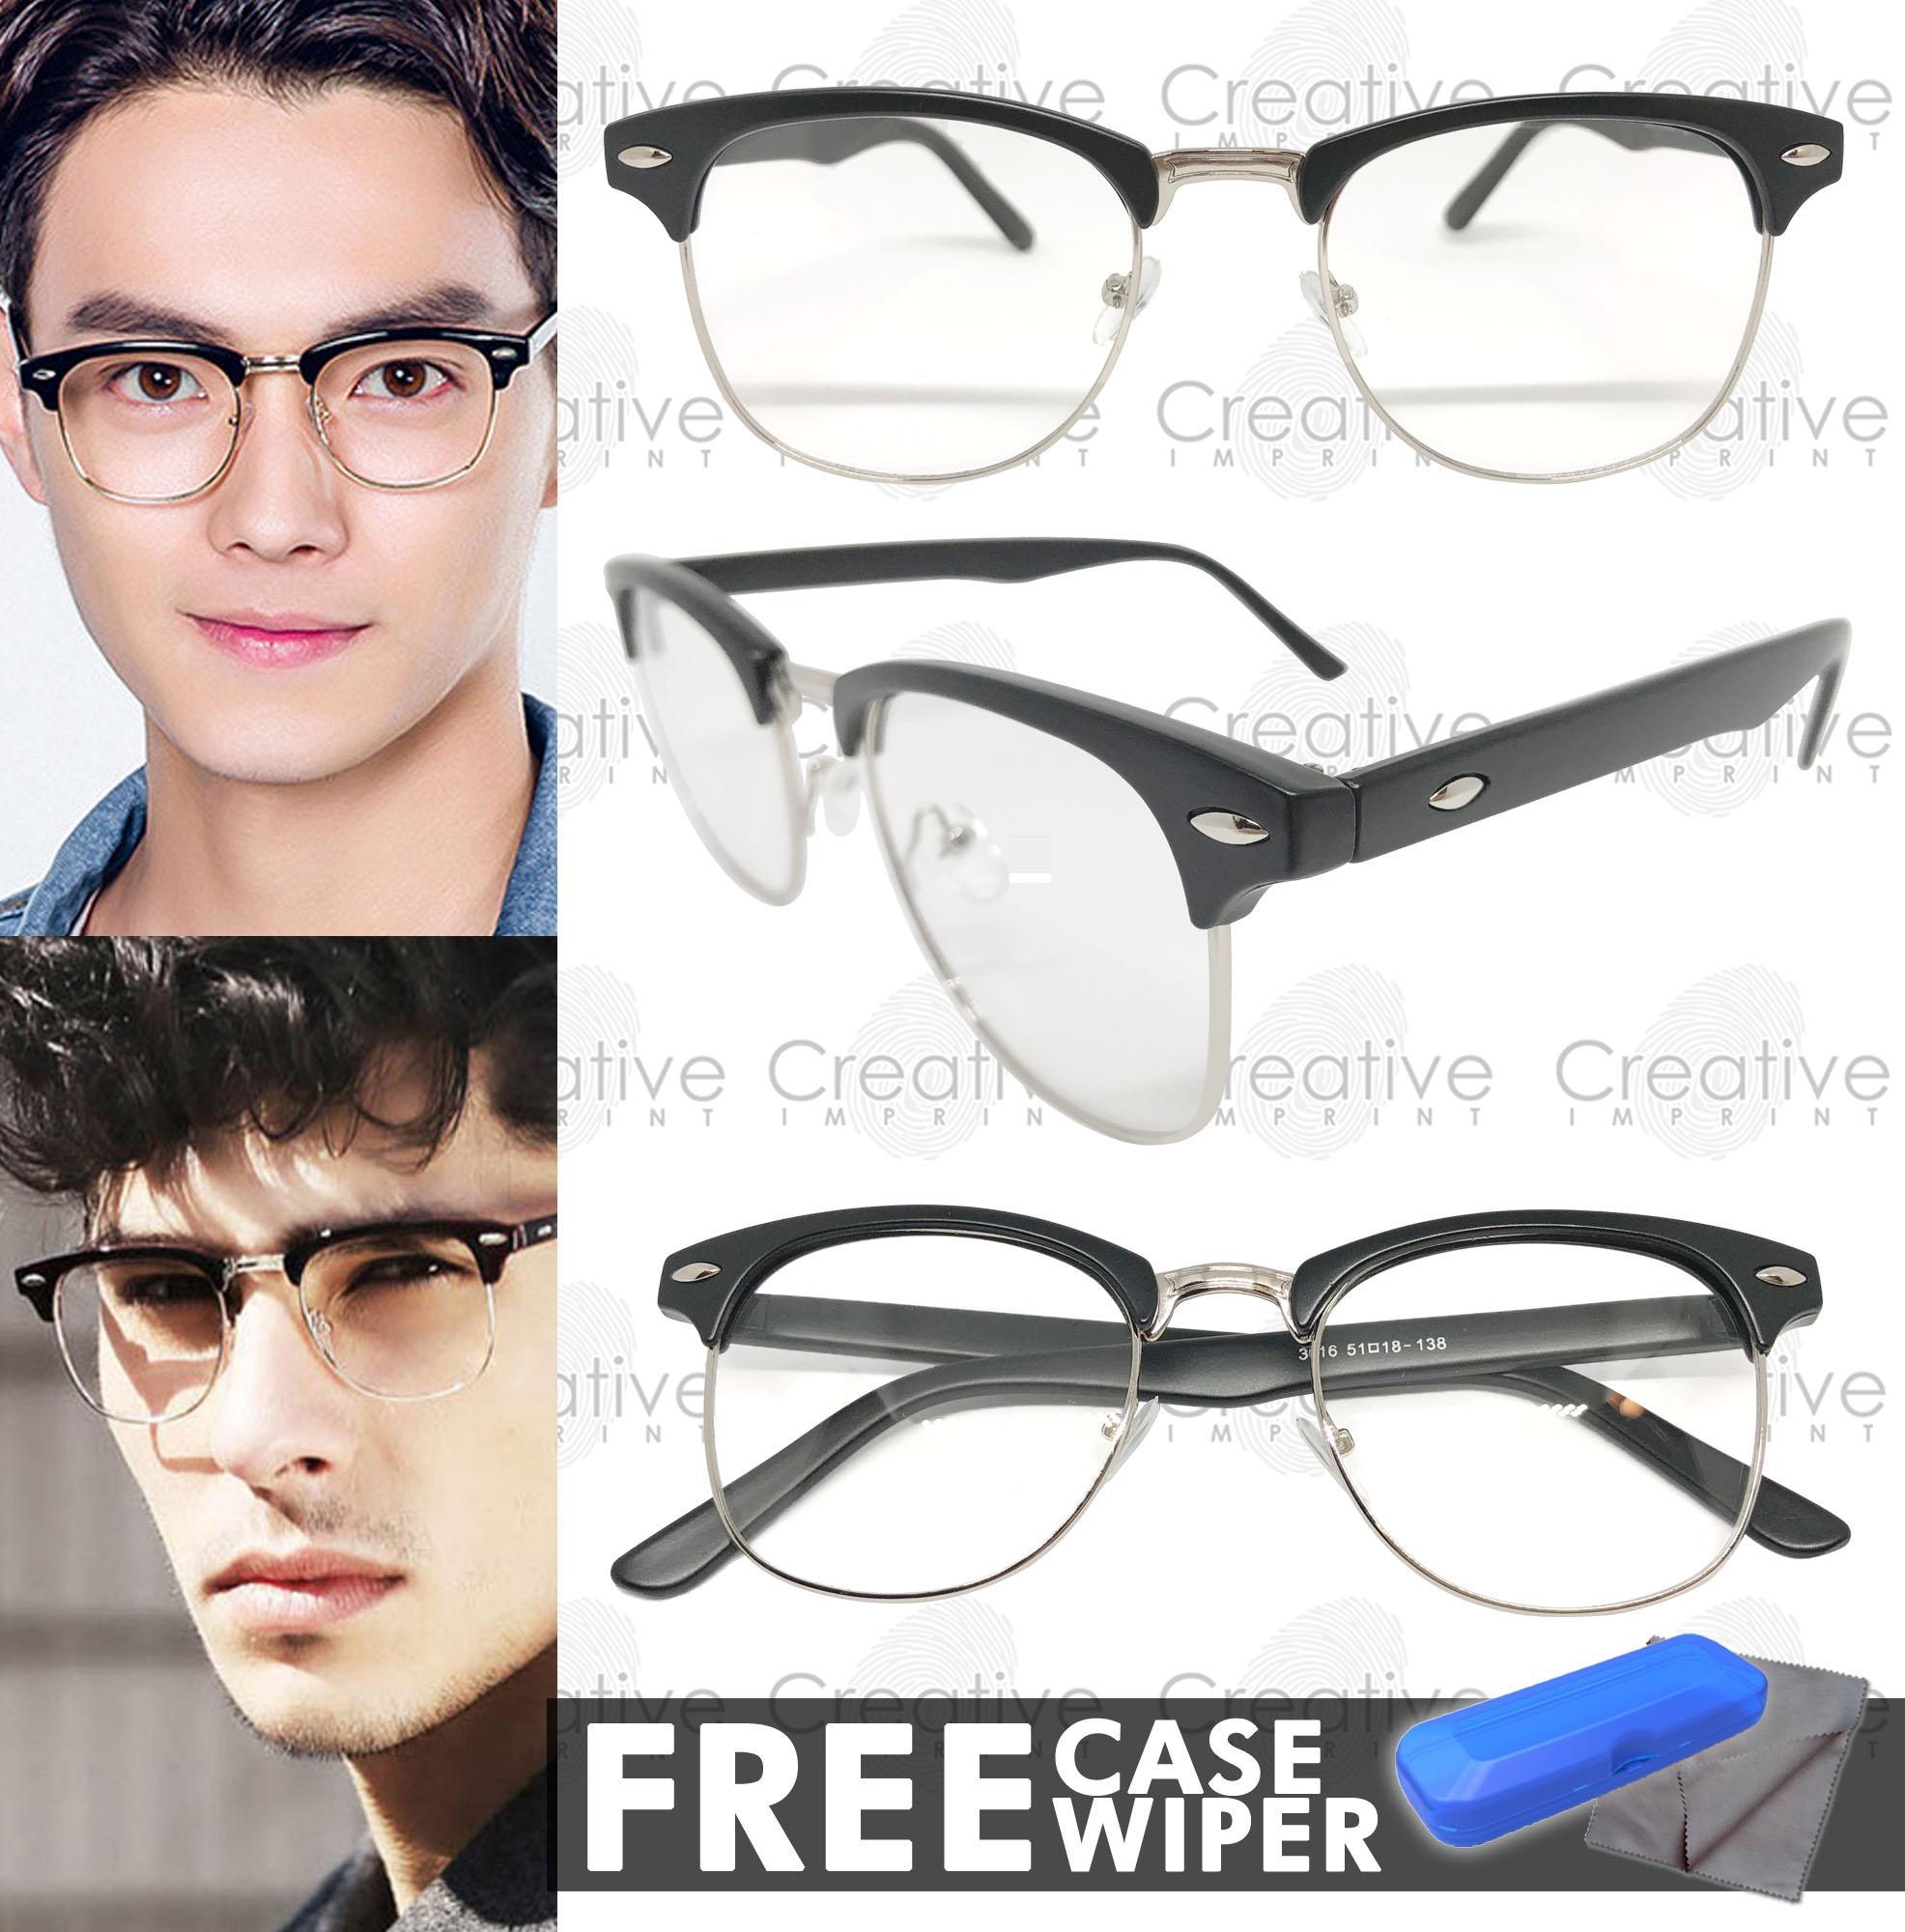 Creative Imprint Eyeglasses Replaceable Lens (Clubmaster  01 Black Silver  Matte) Premium High Quality ad16256111d7